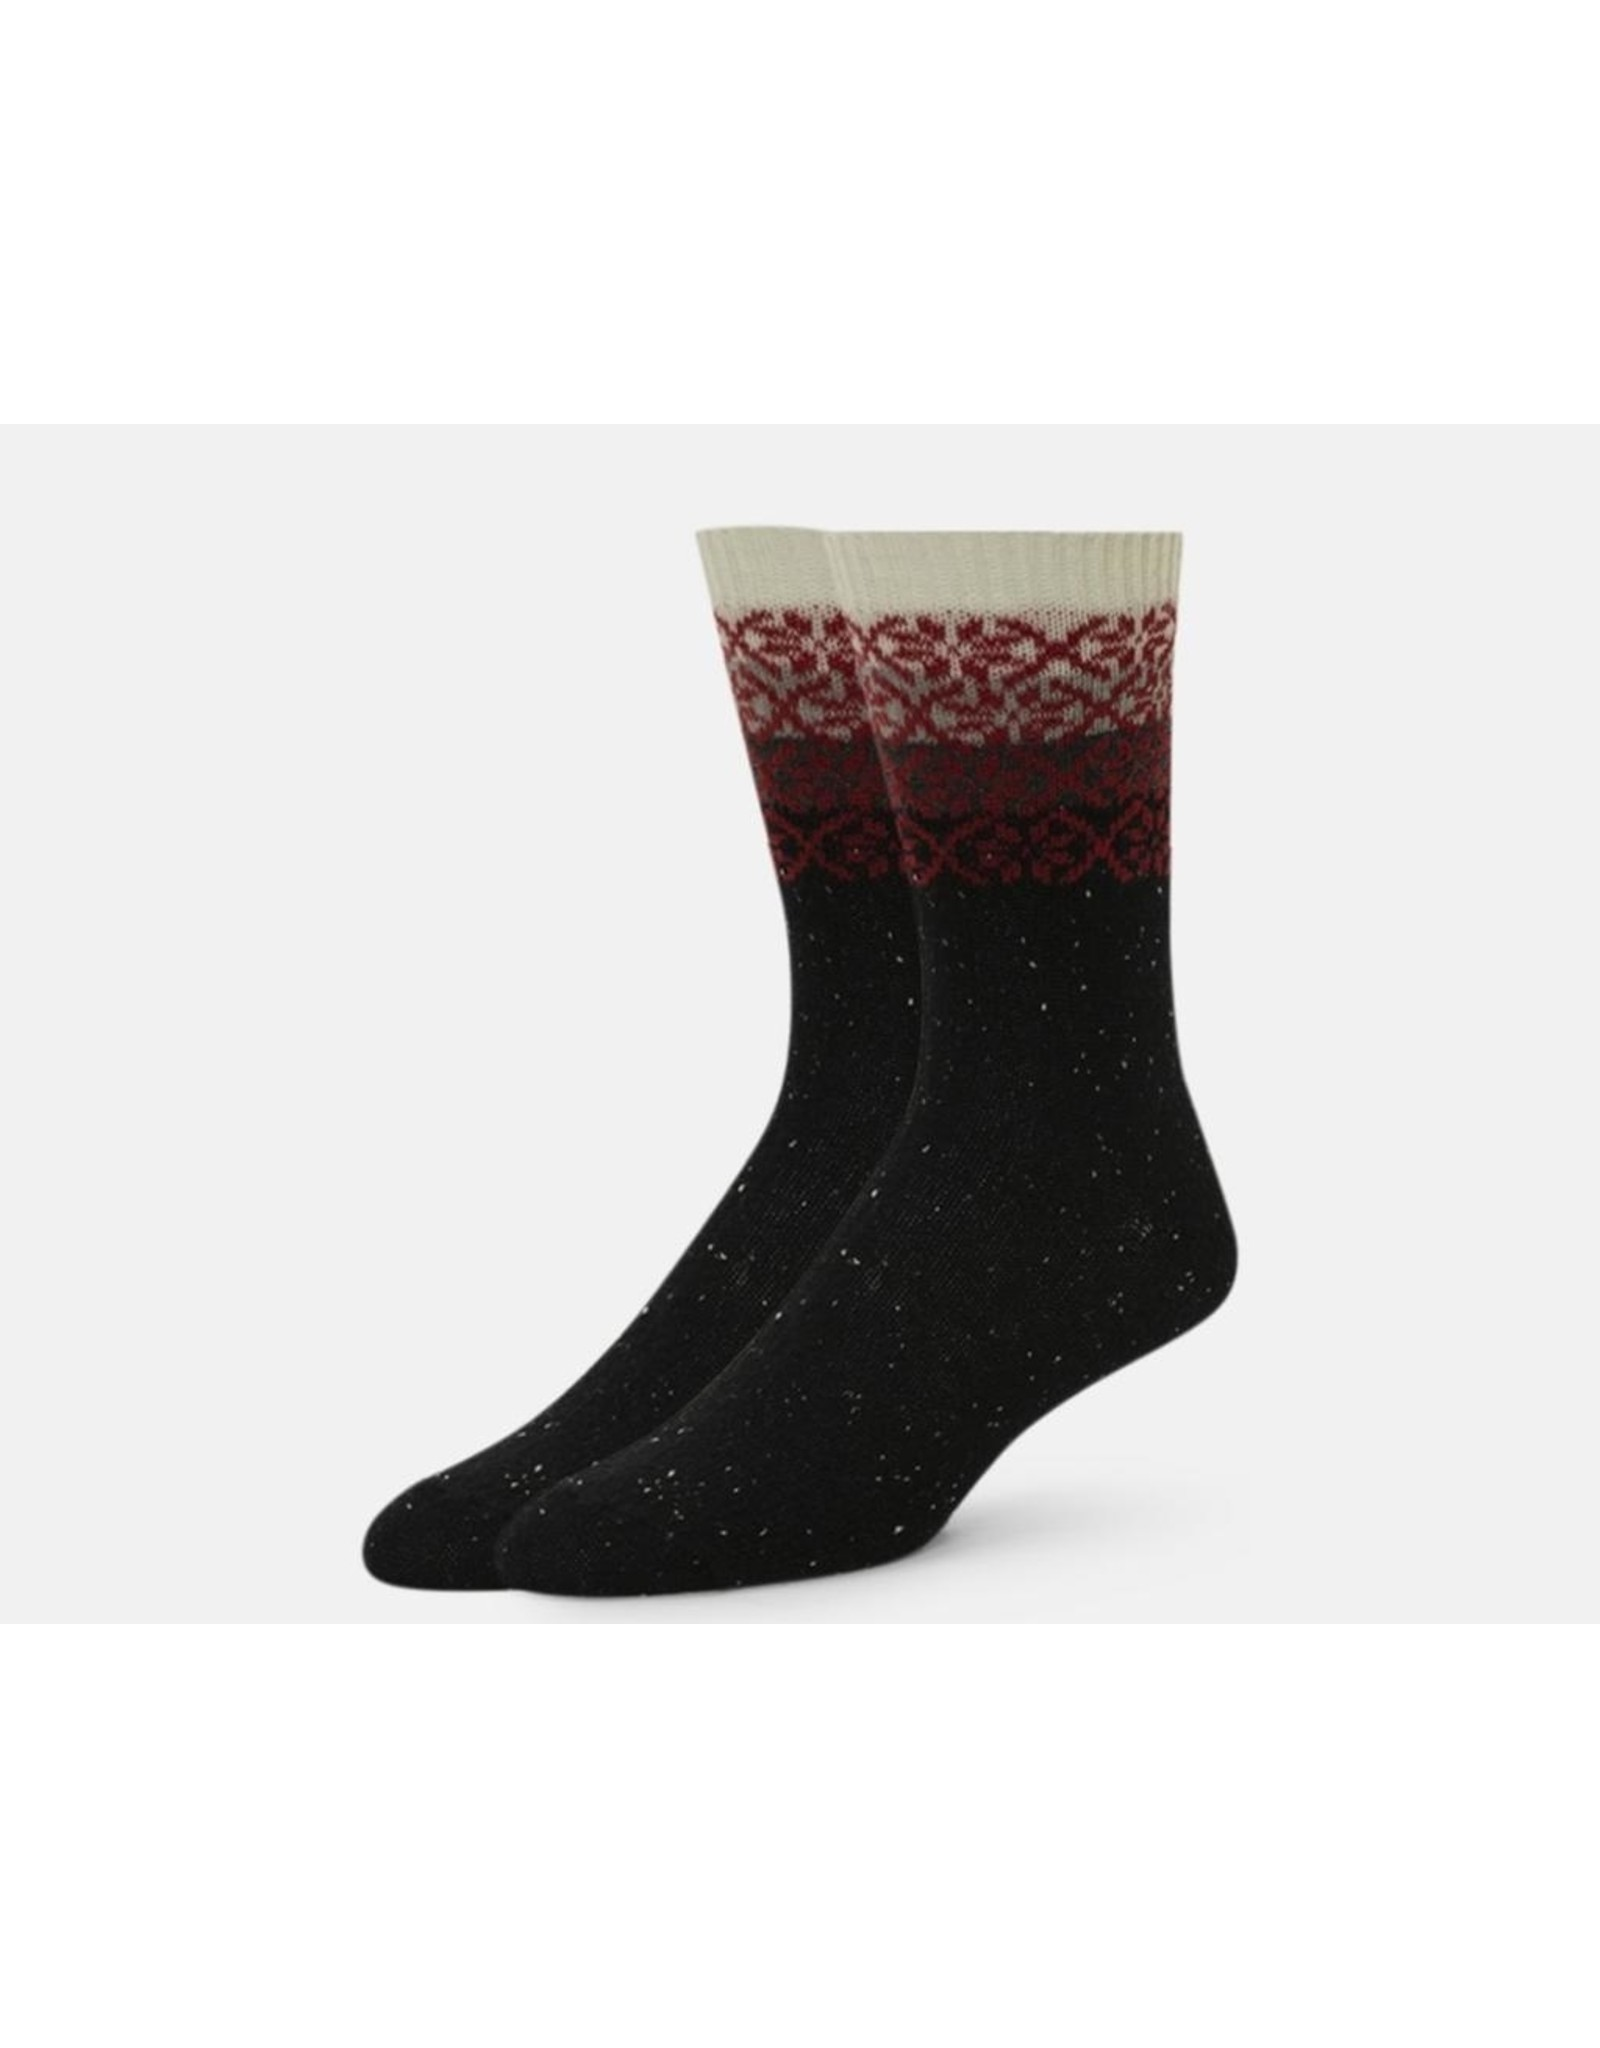 B.ella/Standard Merch Annalise Cashmere Socks